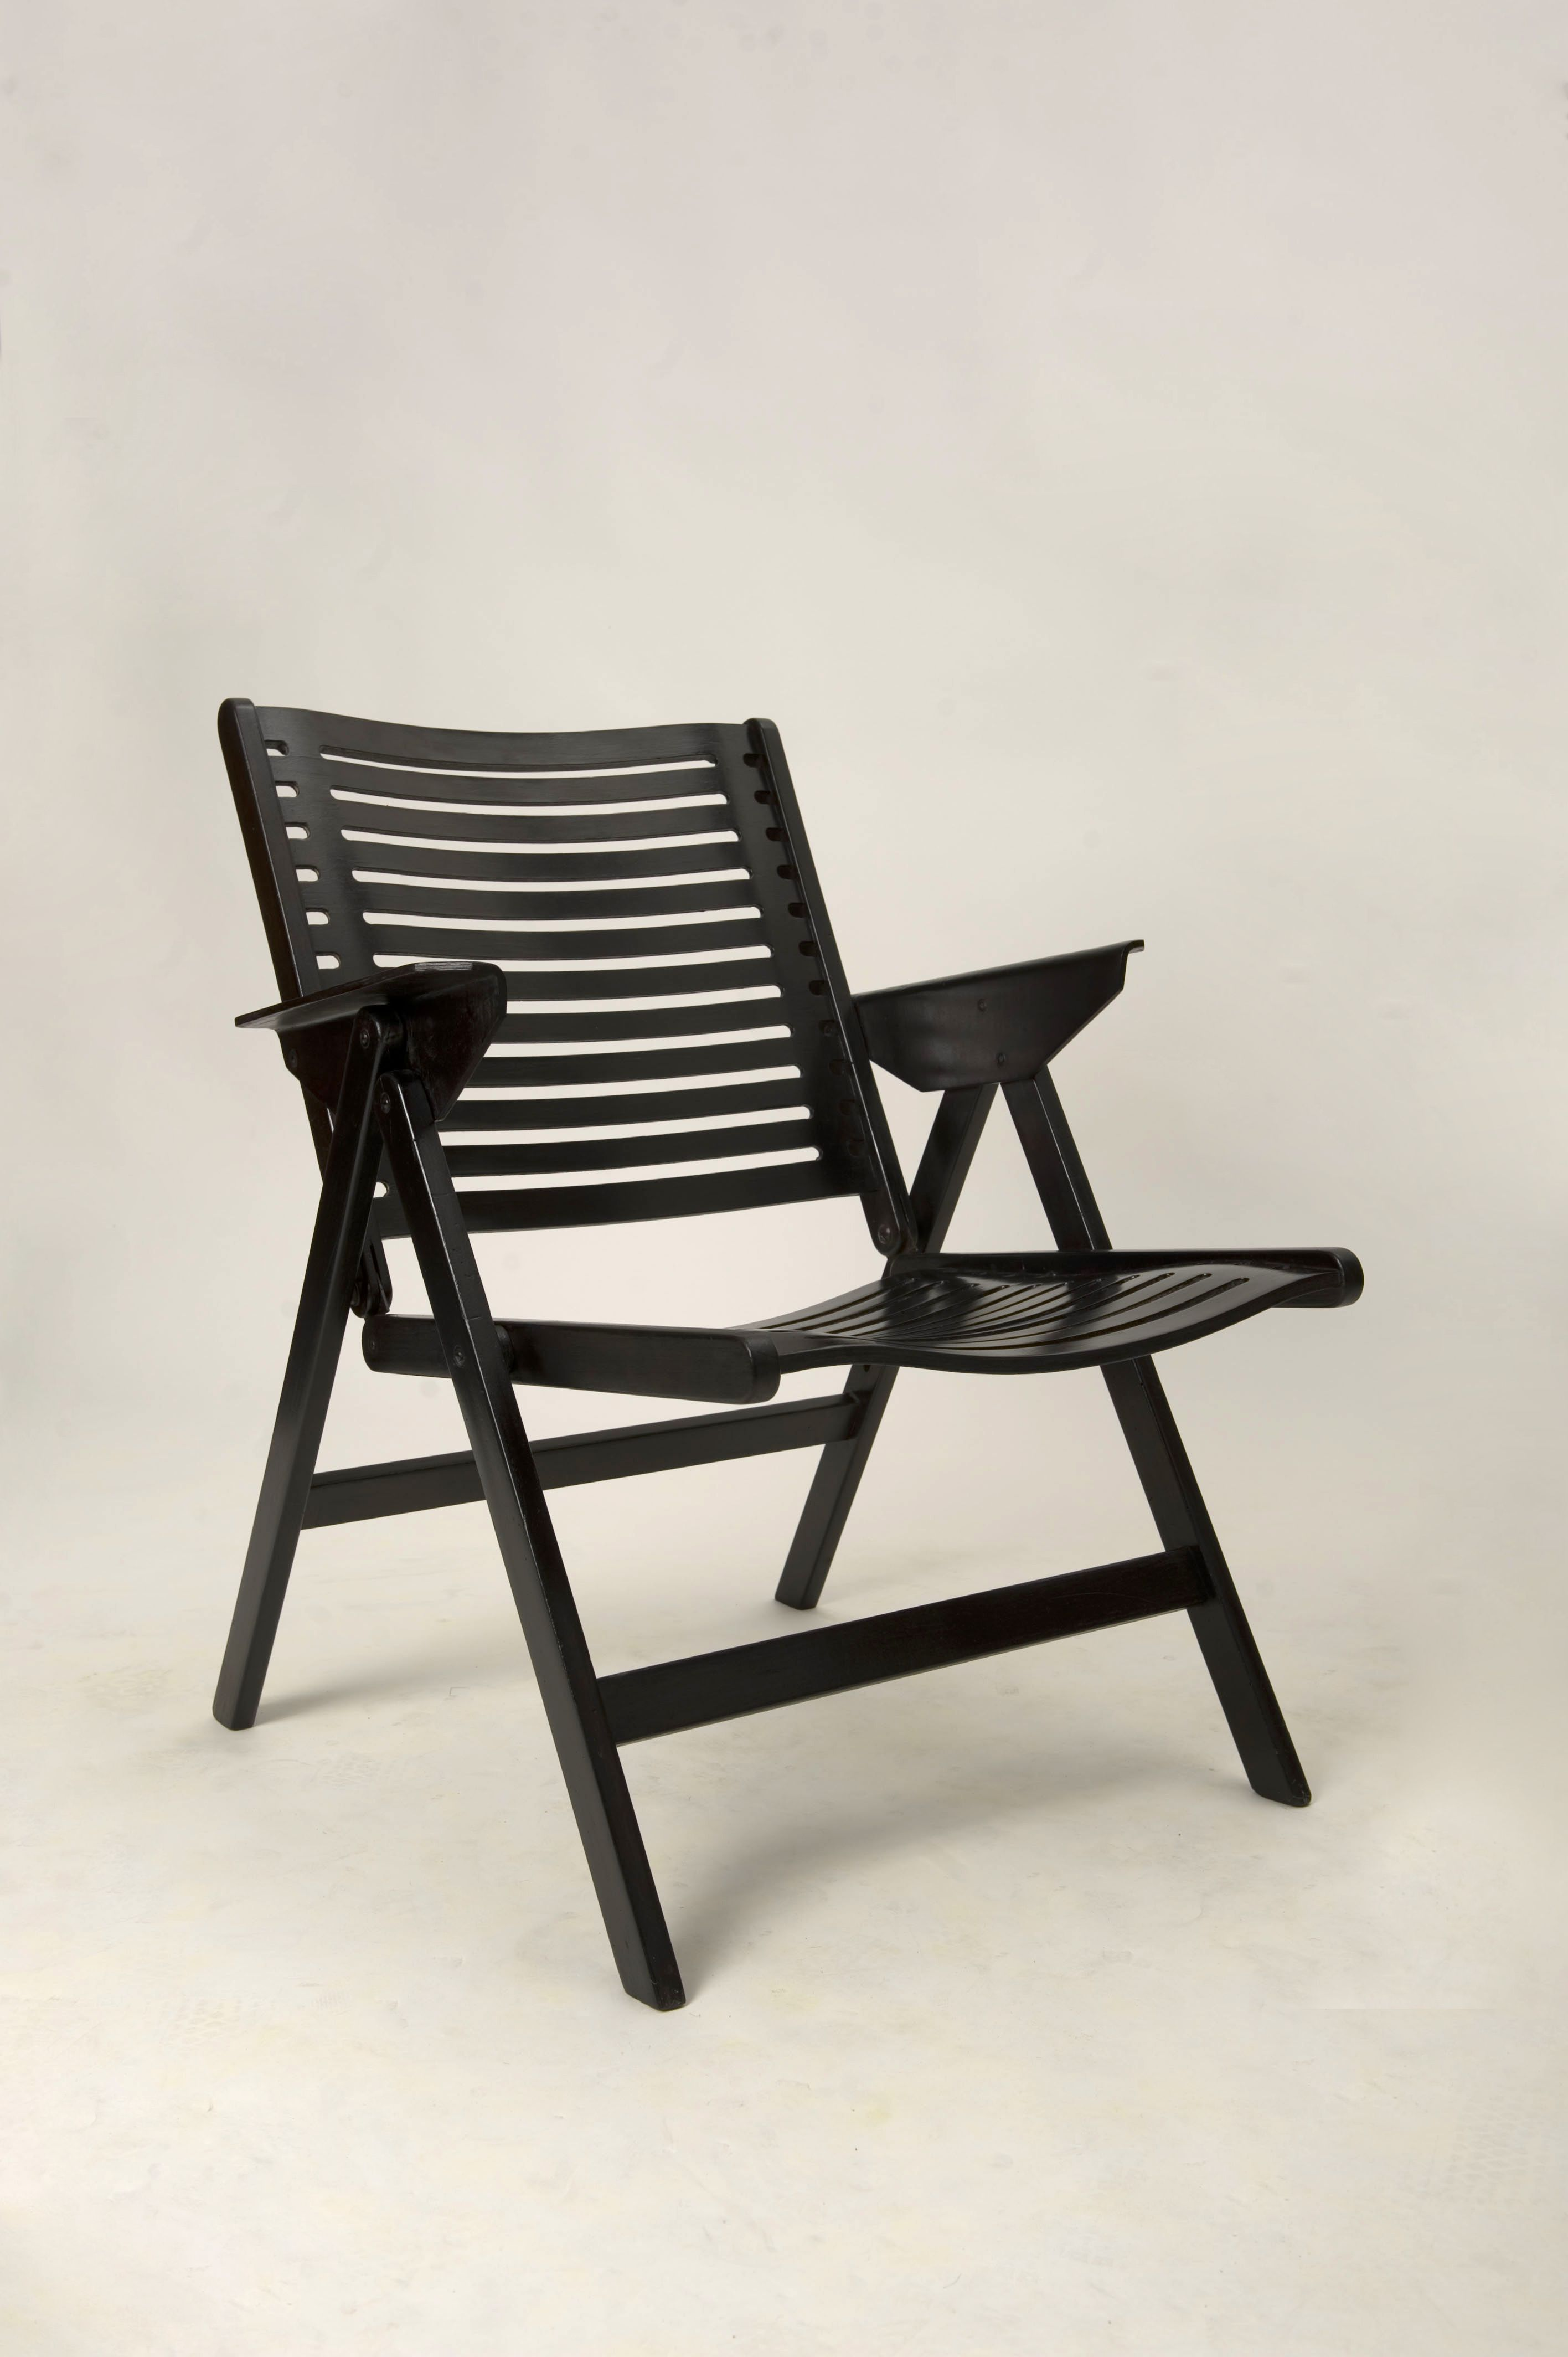 The Quot Rex Quot Chair Is A Scandinavian Design Inspired Wooden